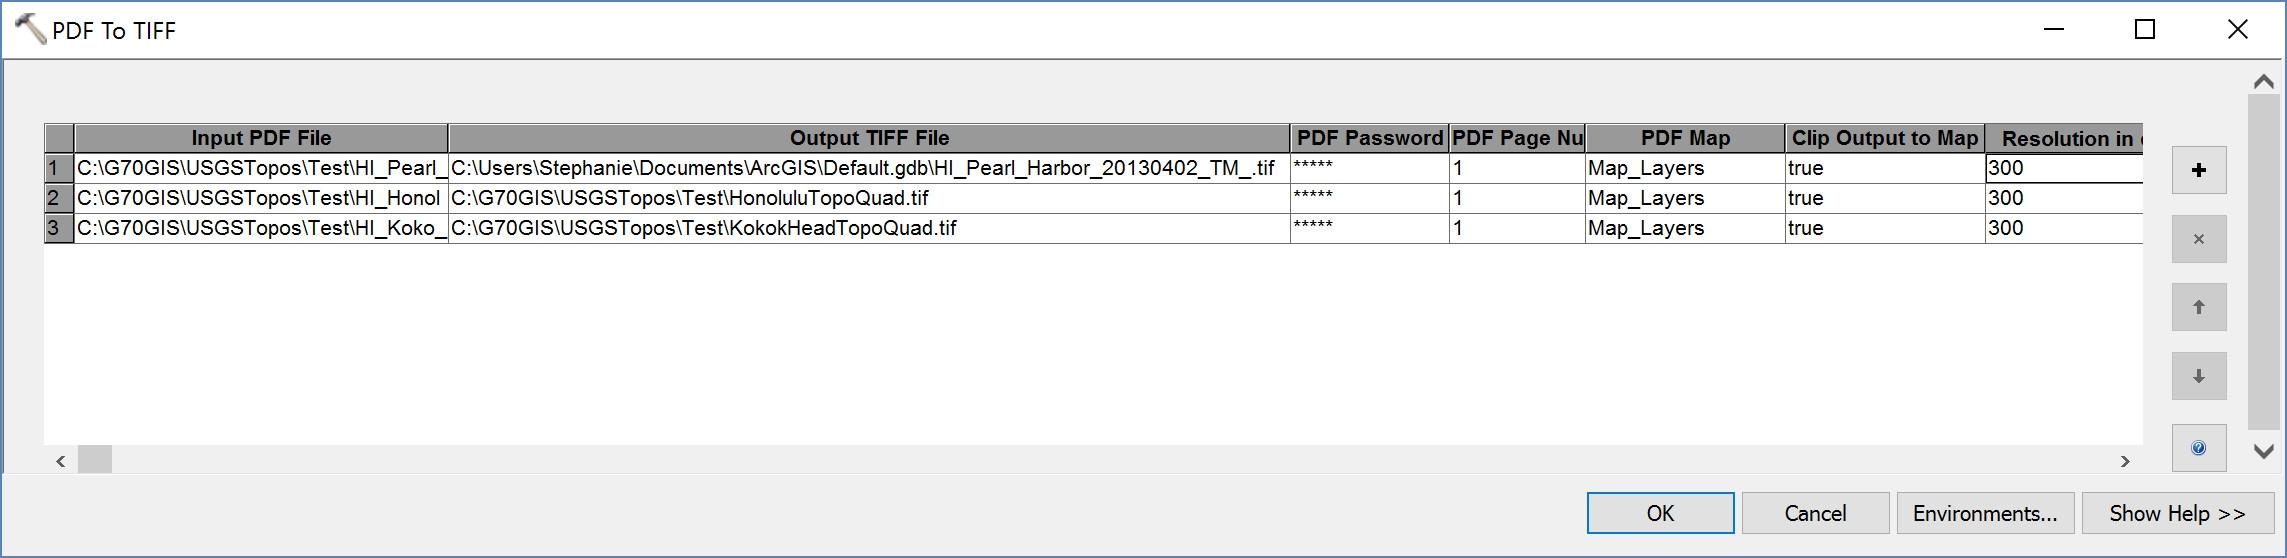 PDF To TIFF Batch Grid Mode